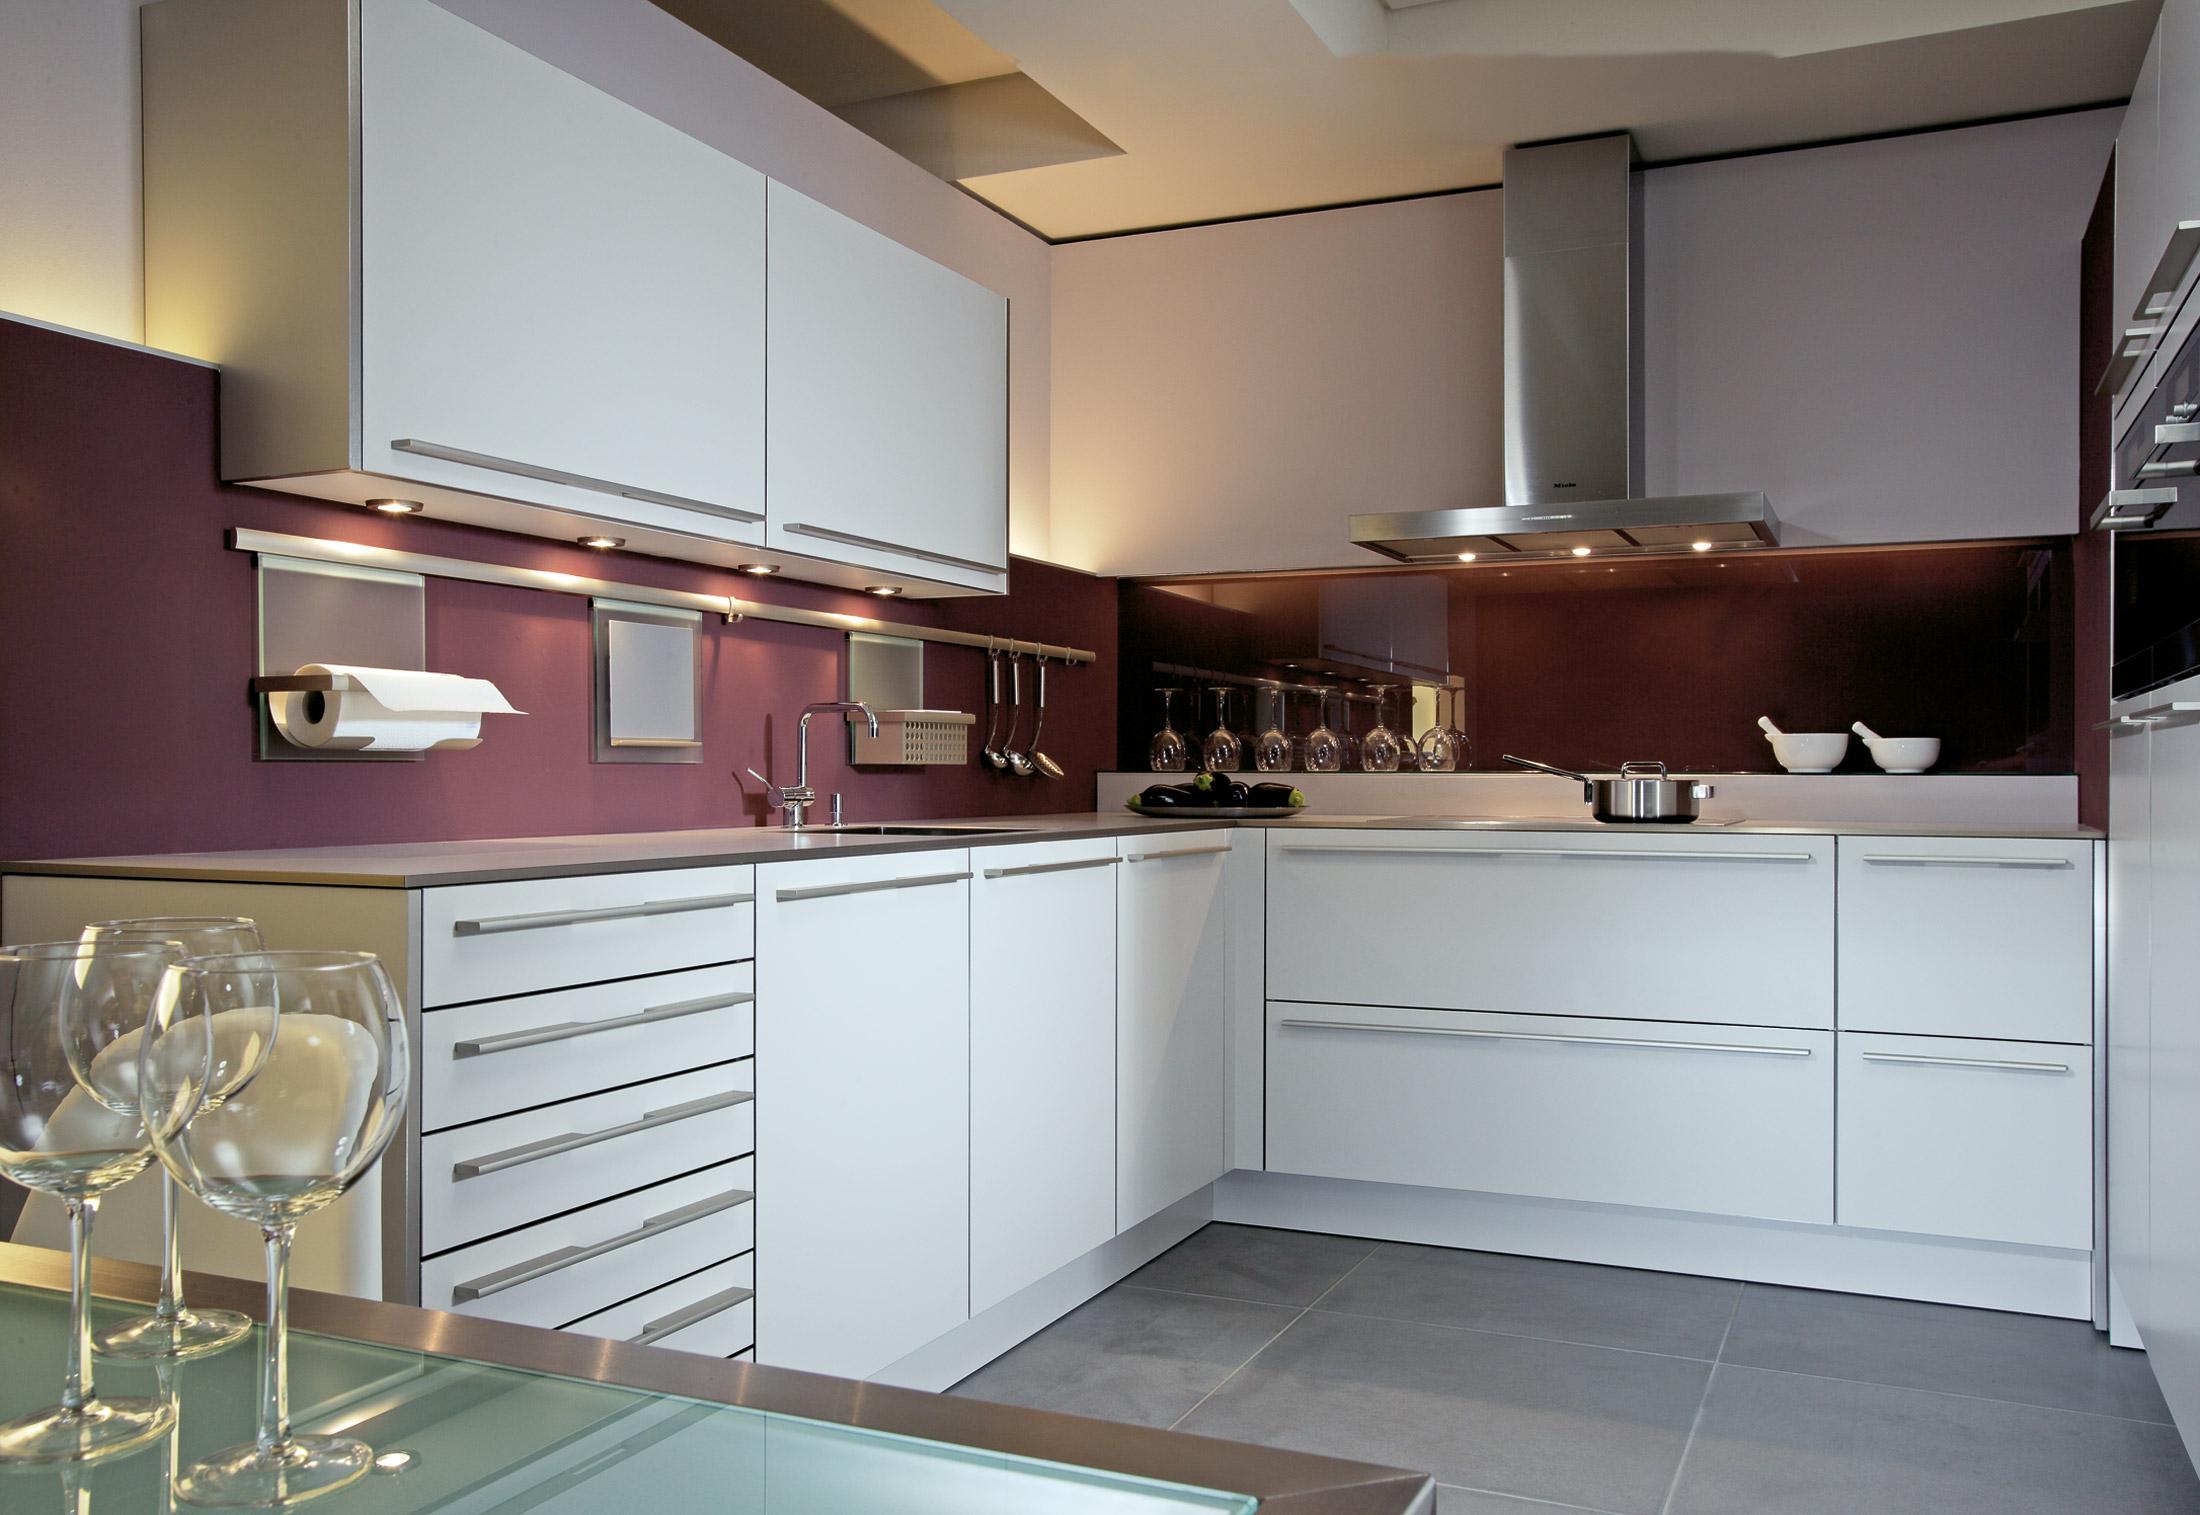 siematic kchen preise gallery of great full size of angebote inkl gerte jetzt entdecken preise. Black Bedroom Furniture Sets. Home Design Ideas